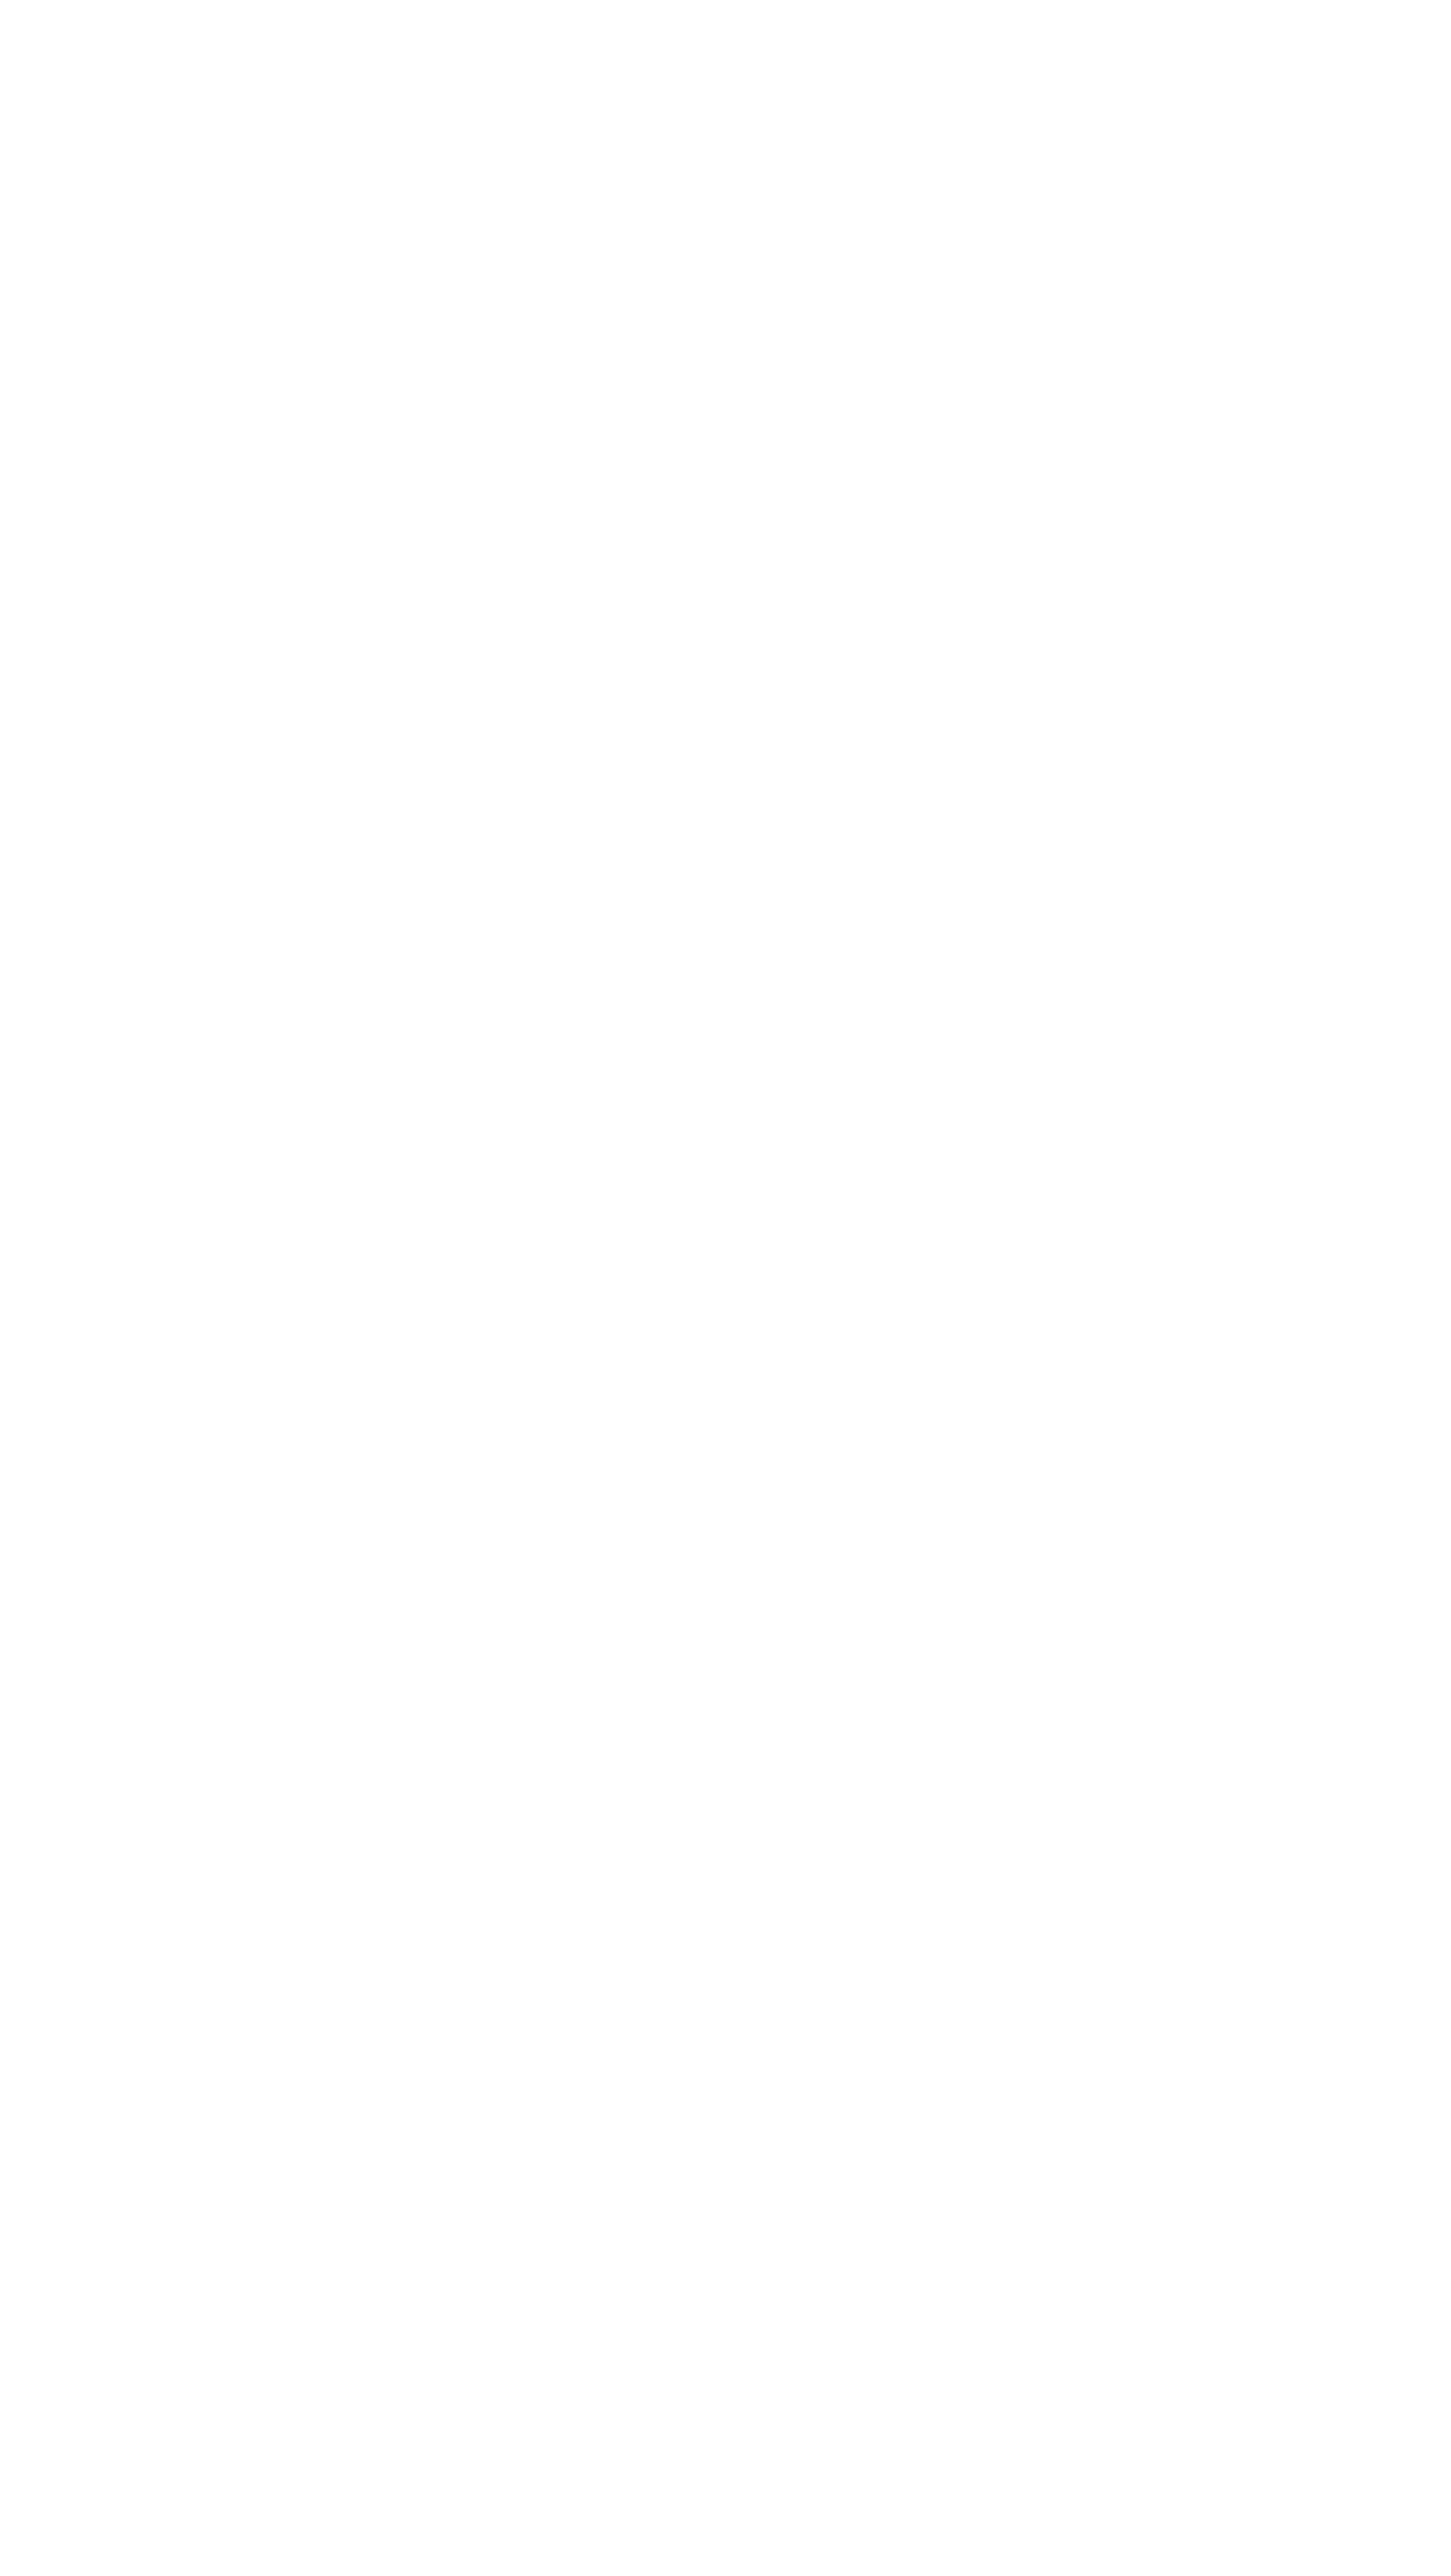 MapKnitter: aac-white-buffer-block